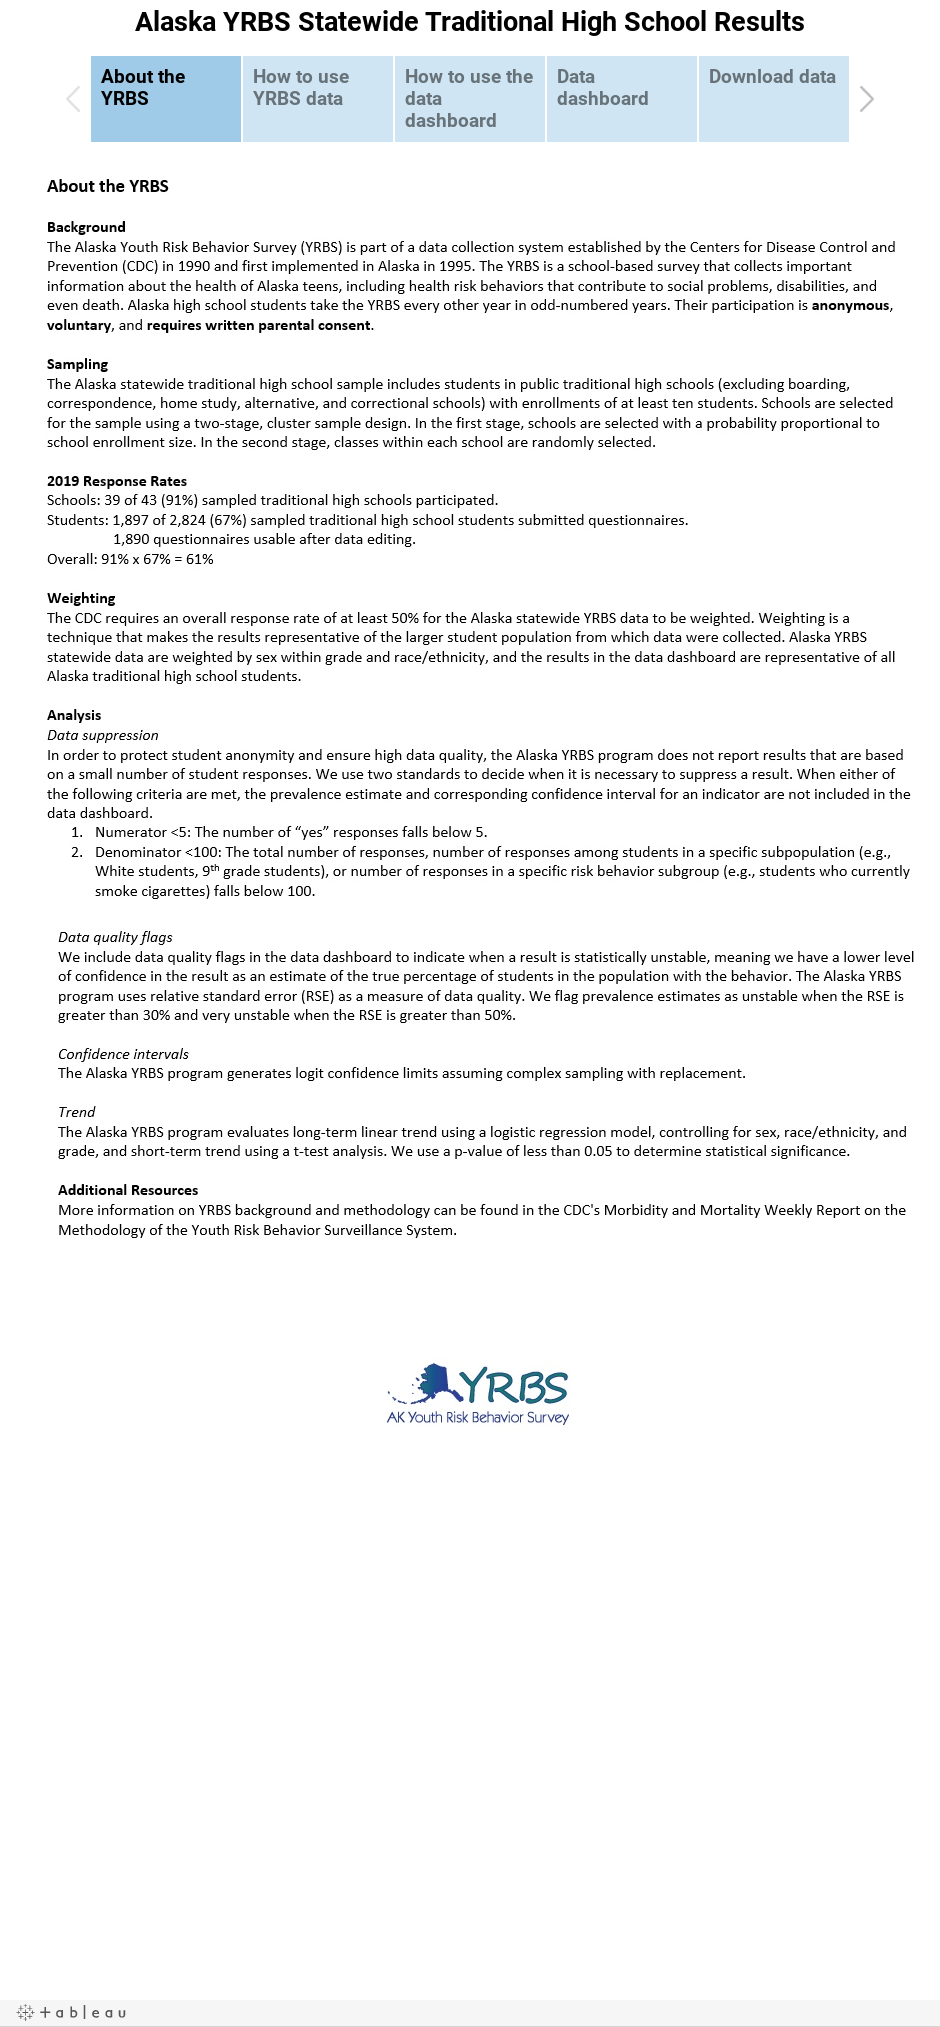 Alaska YRBS Statewide Traditional High School Results